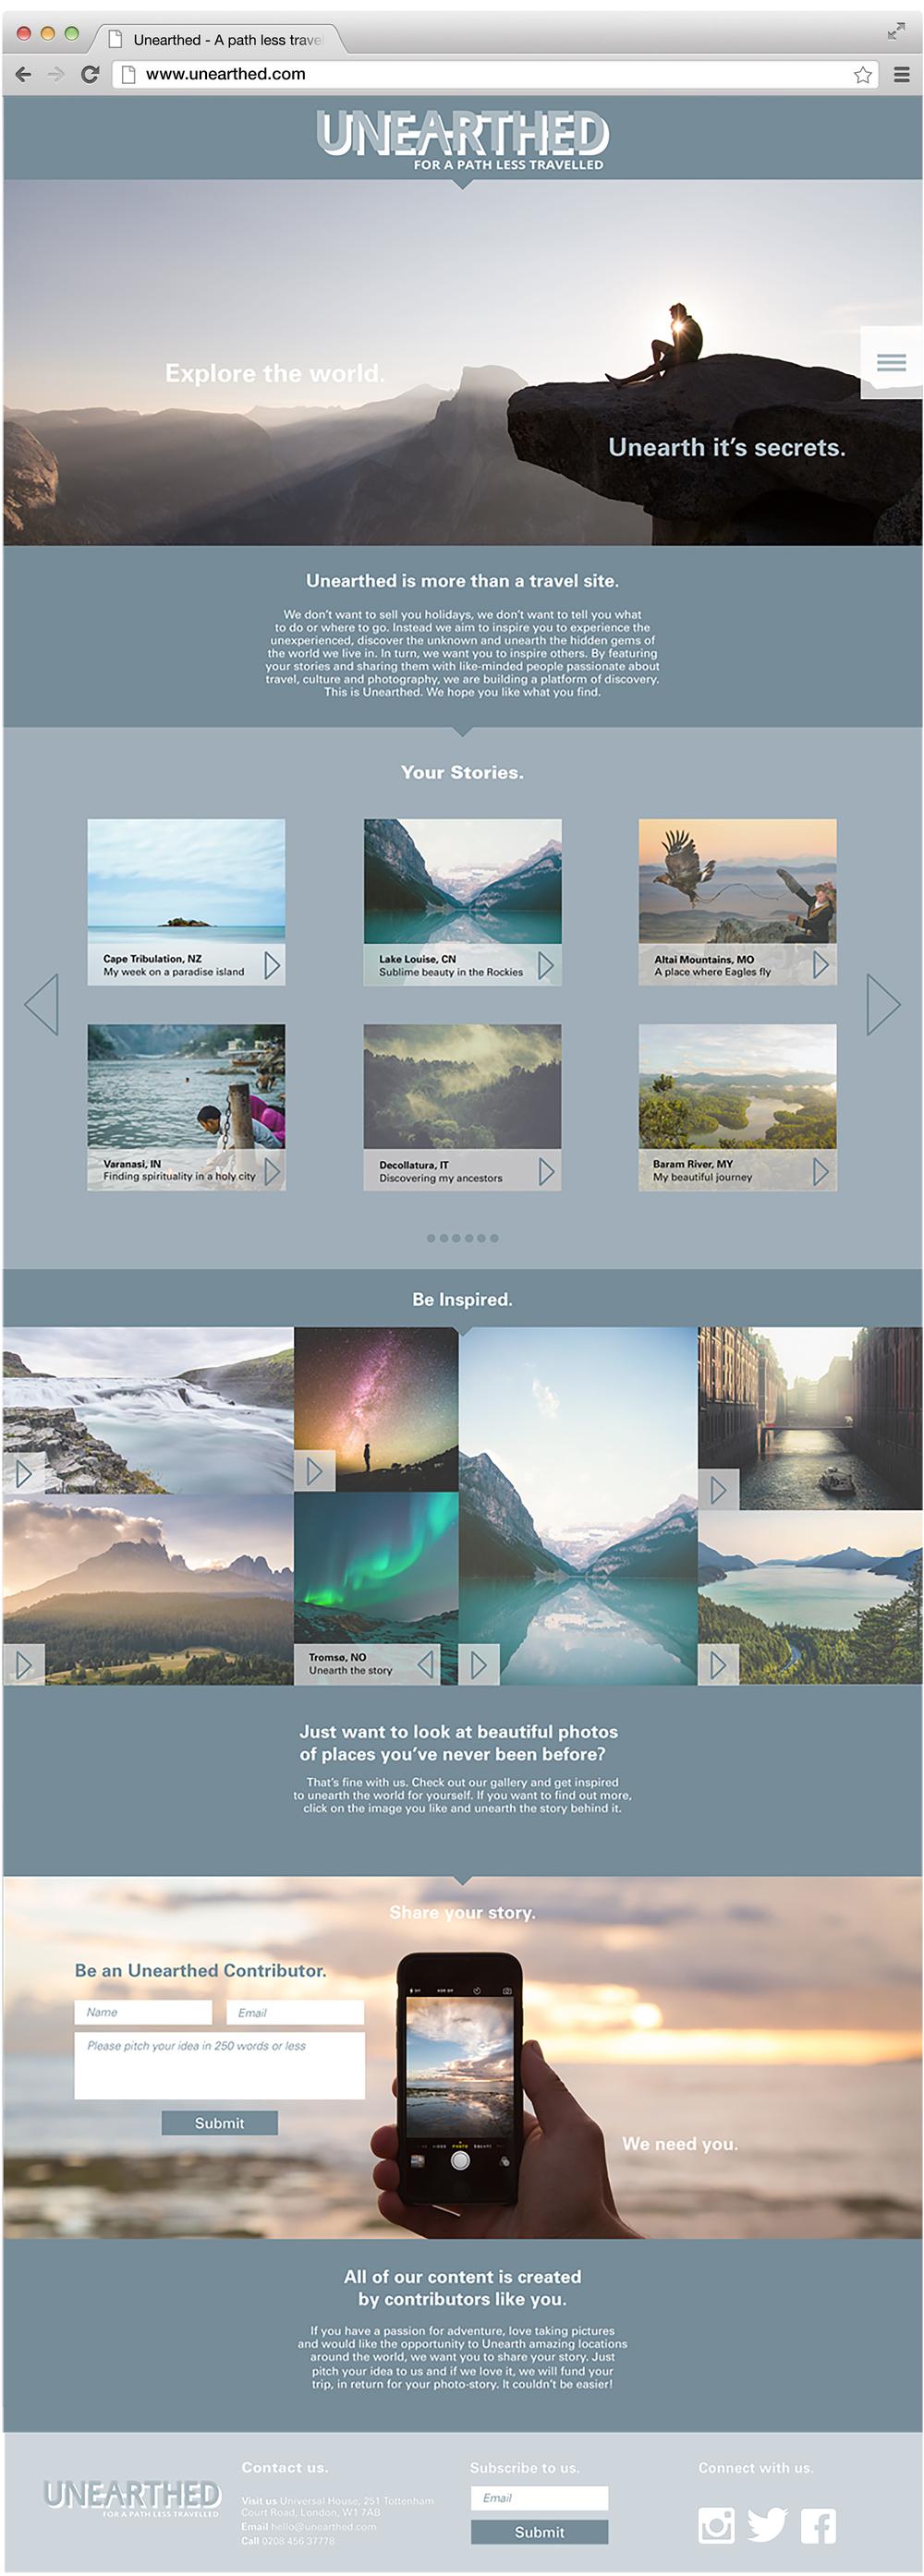 UEmainscreenwebsite.jpg